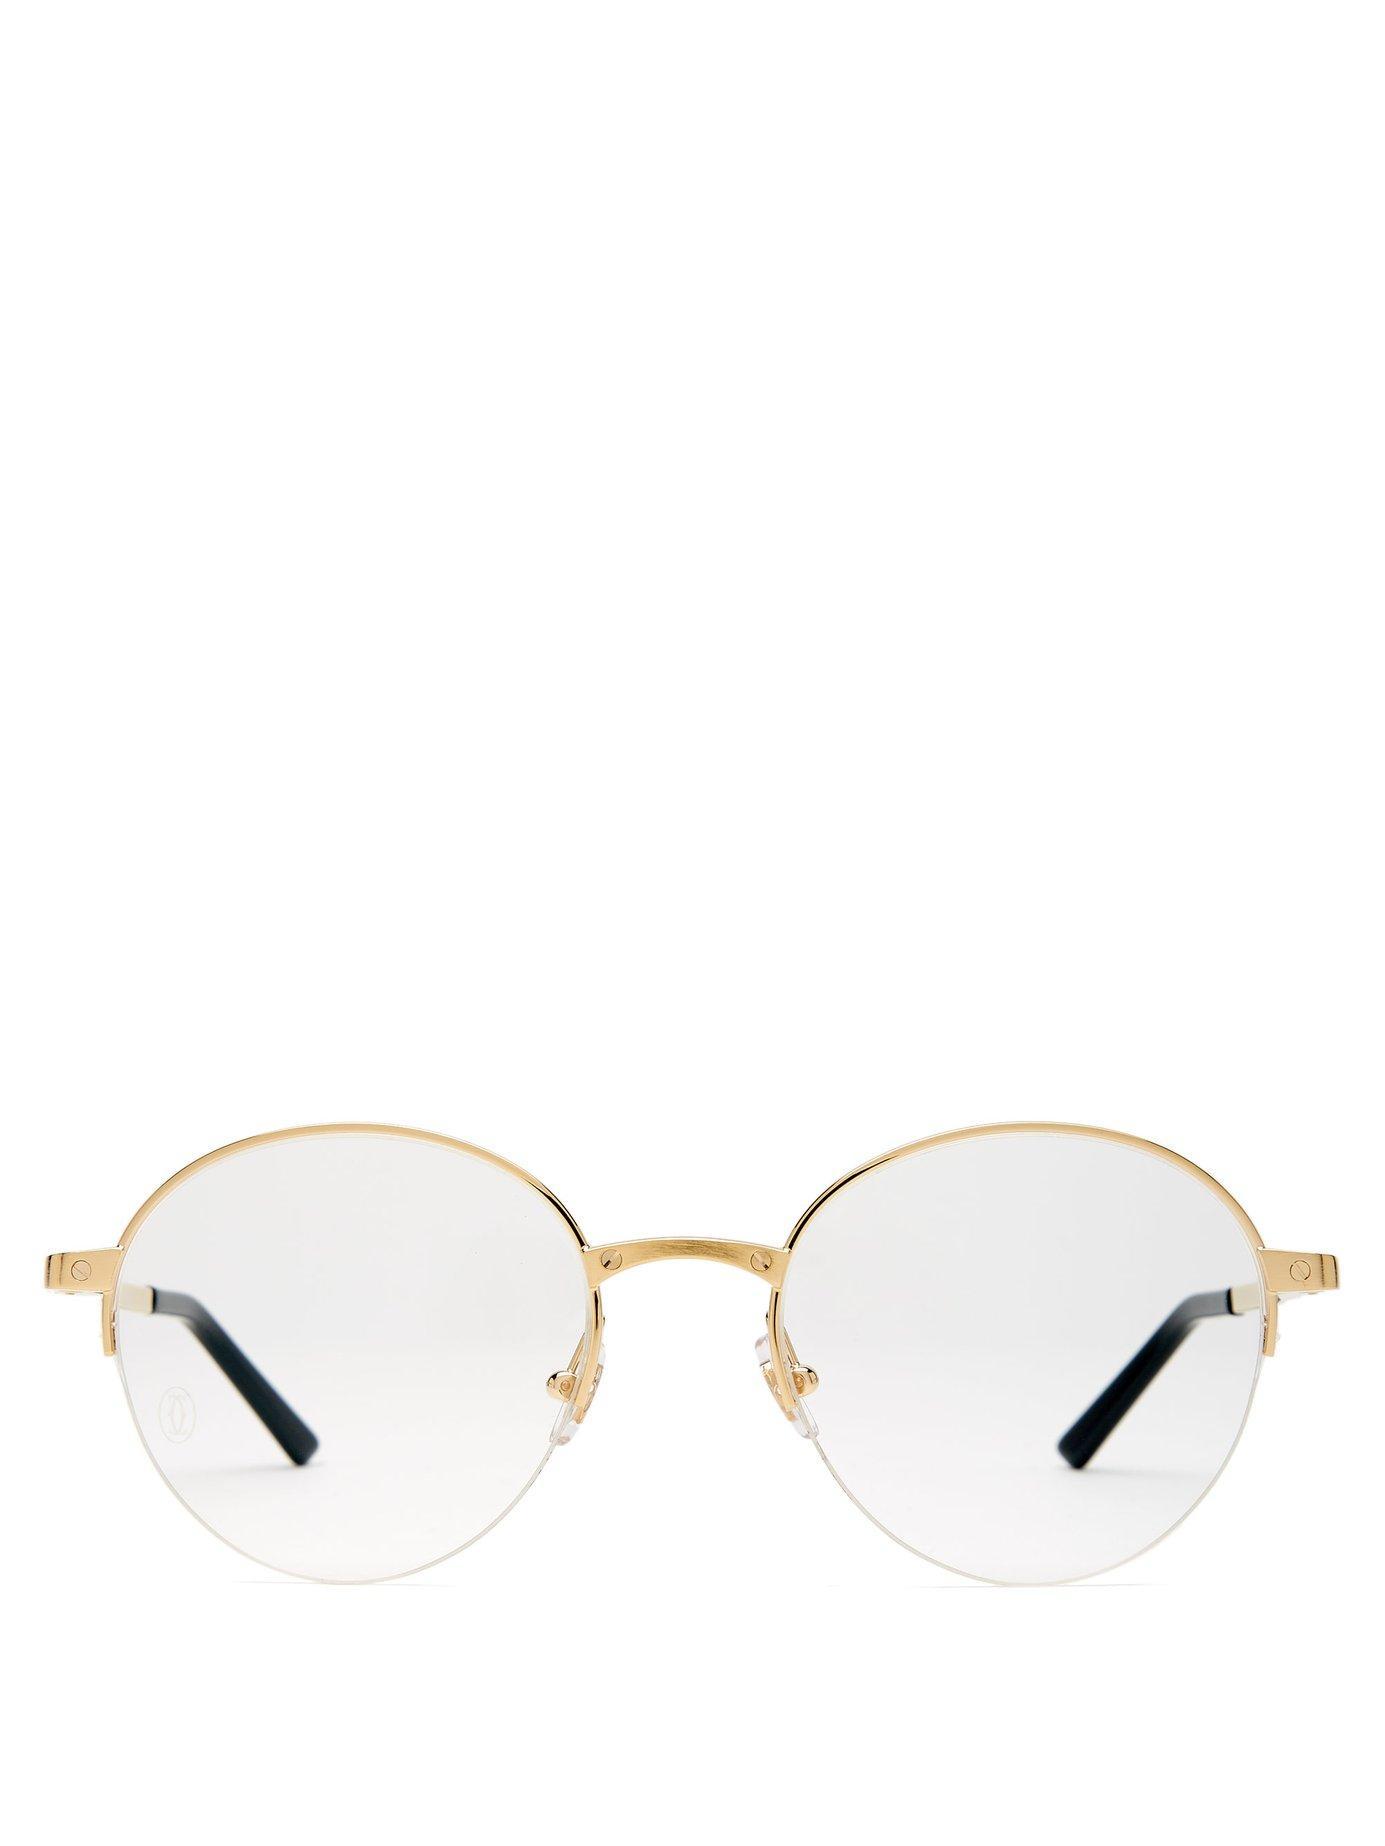 b4e26dba76 Cartier Screw Stud Round Frame Glasses in Metallic for Men - Lyst